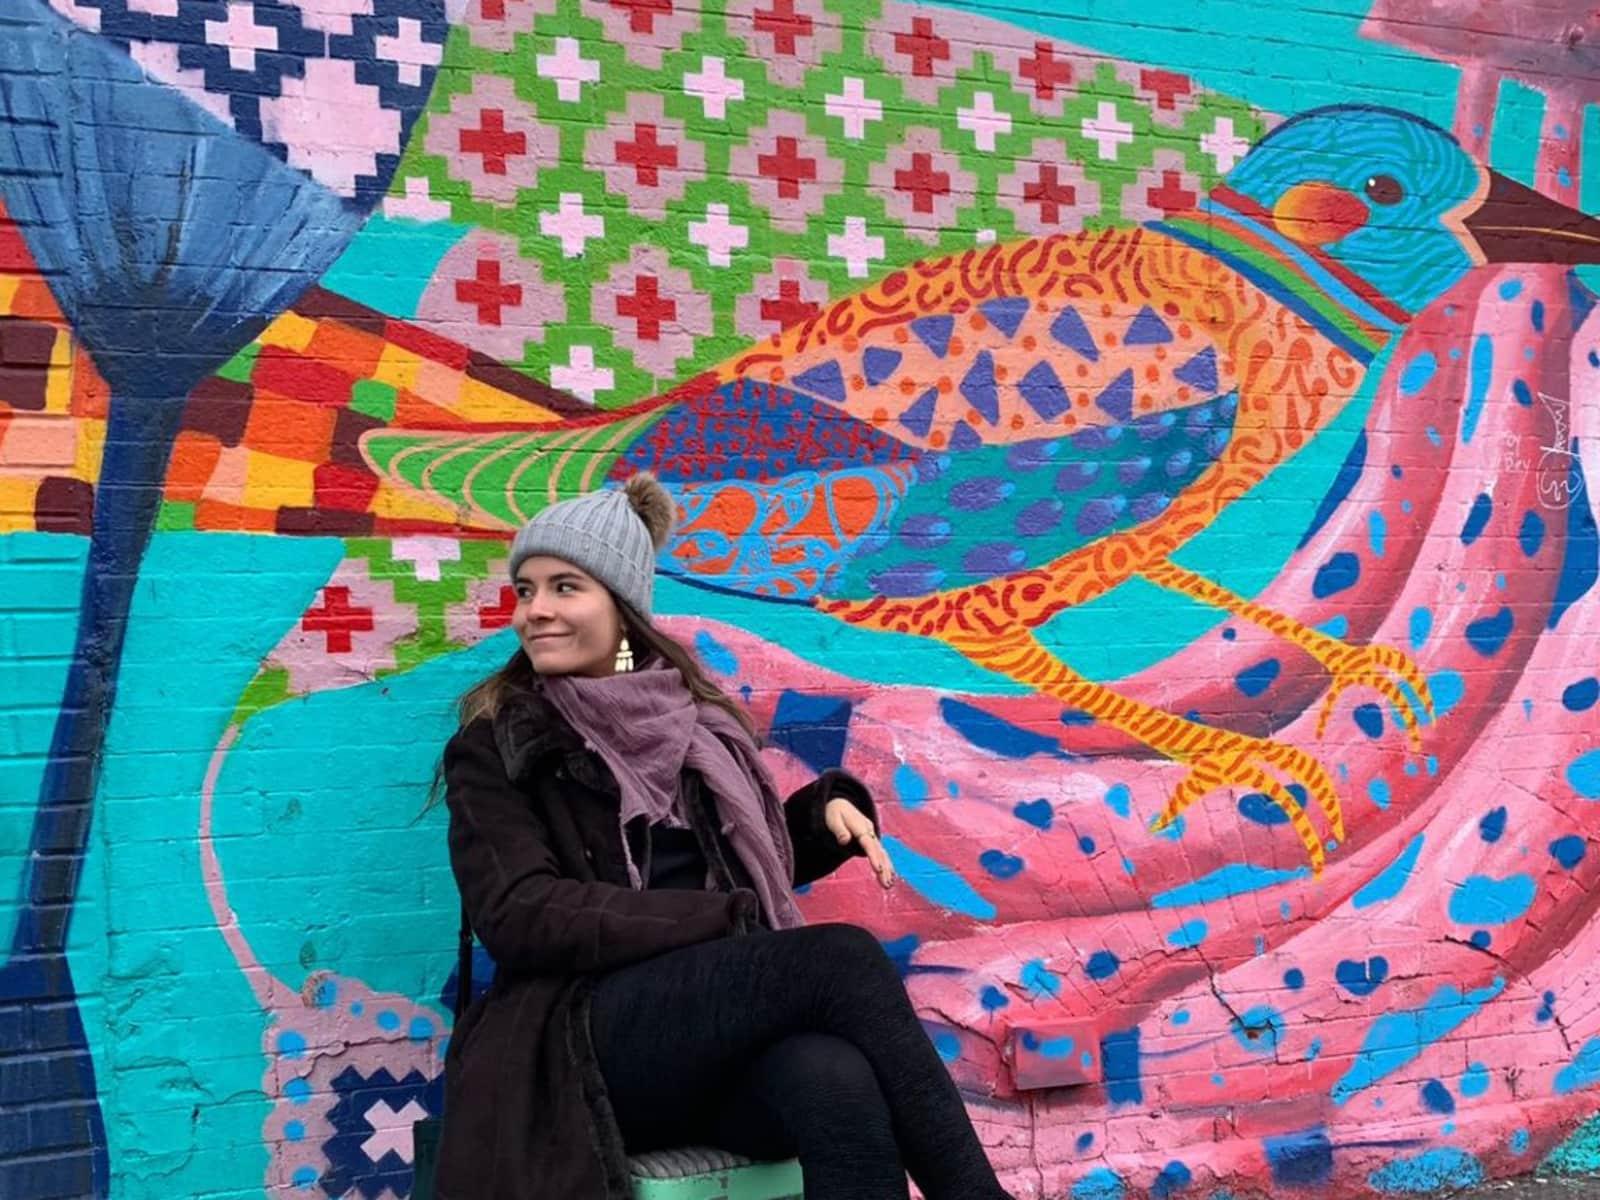 Carola saez from New York City, New York, United States